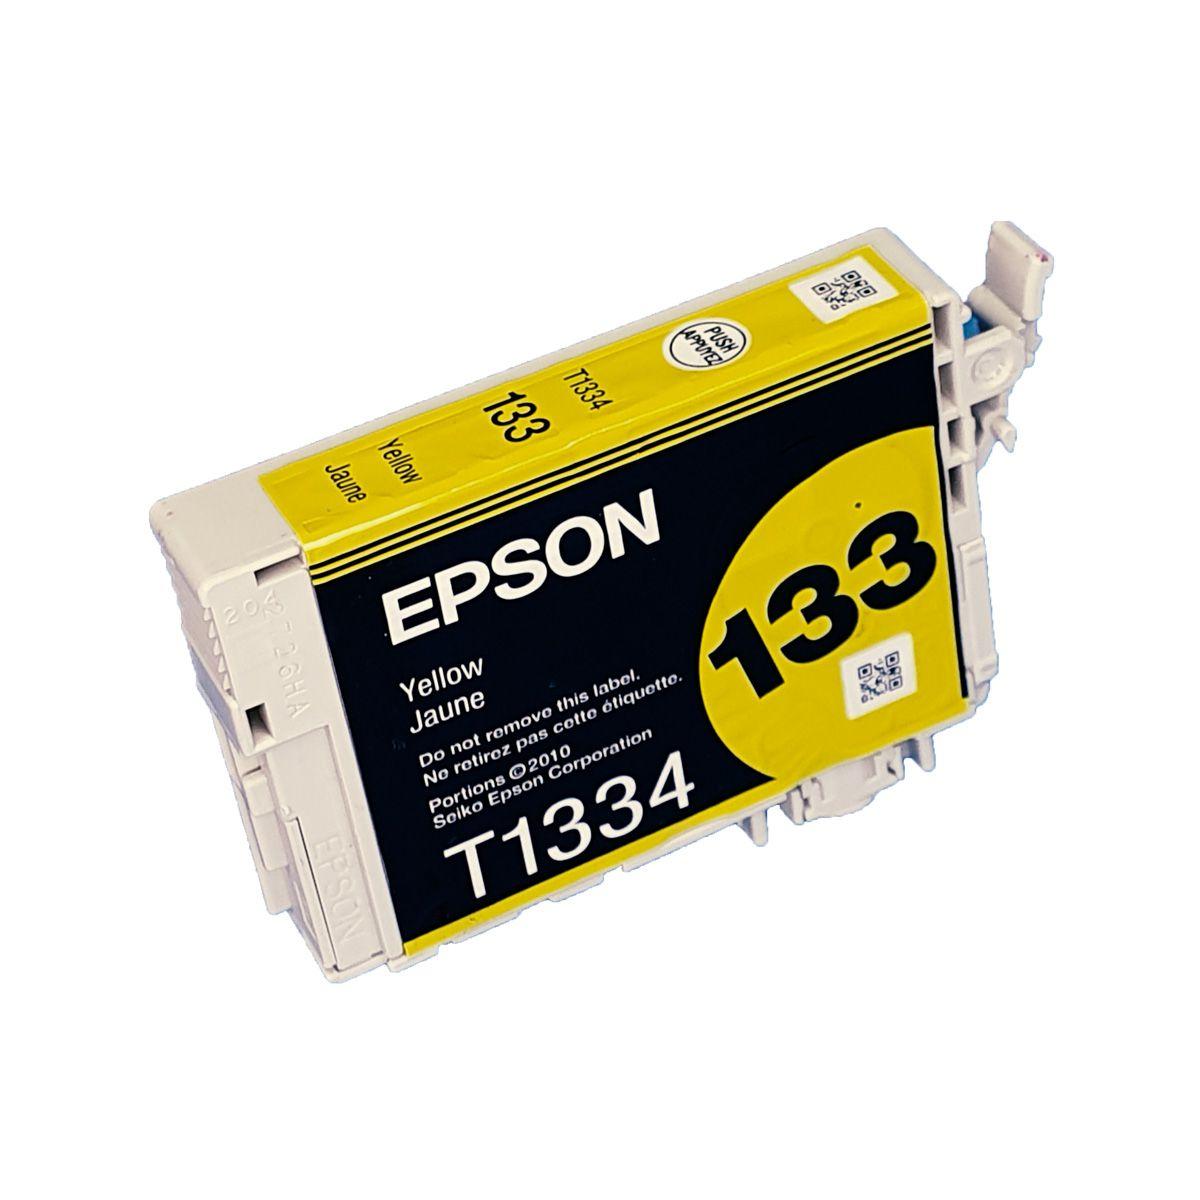 Cartucho EPSON T1334 133 Amarelo para TX120 TX123 TX125 TX133 TX135